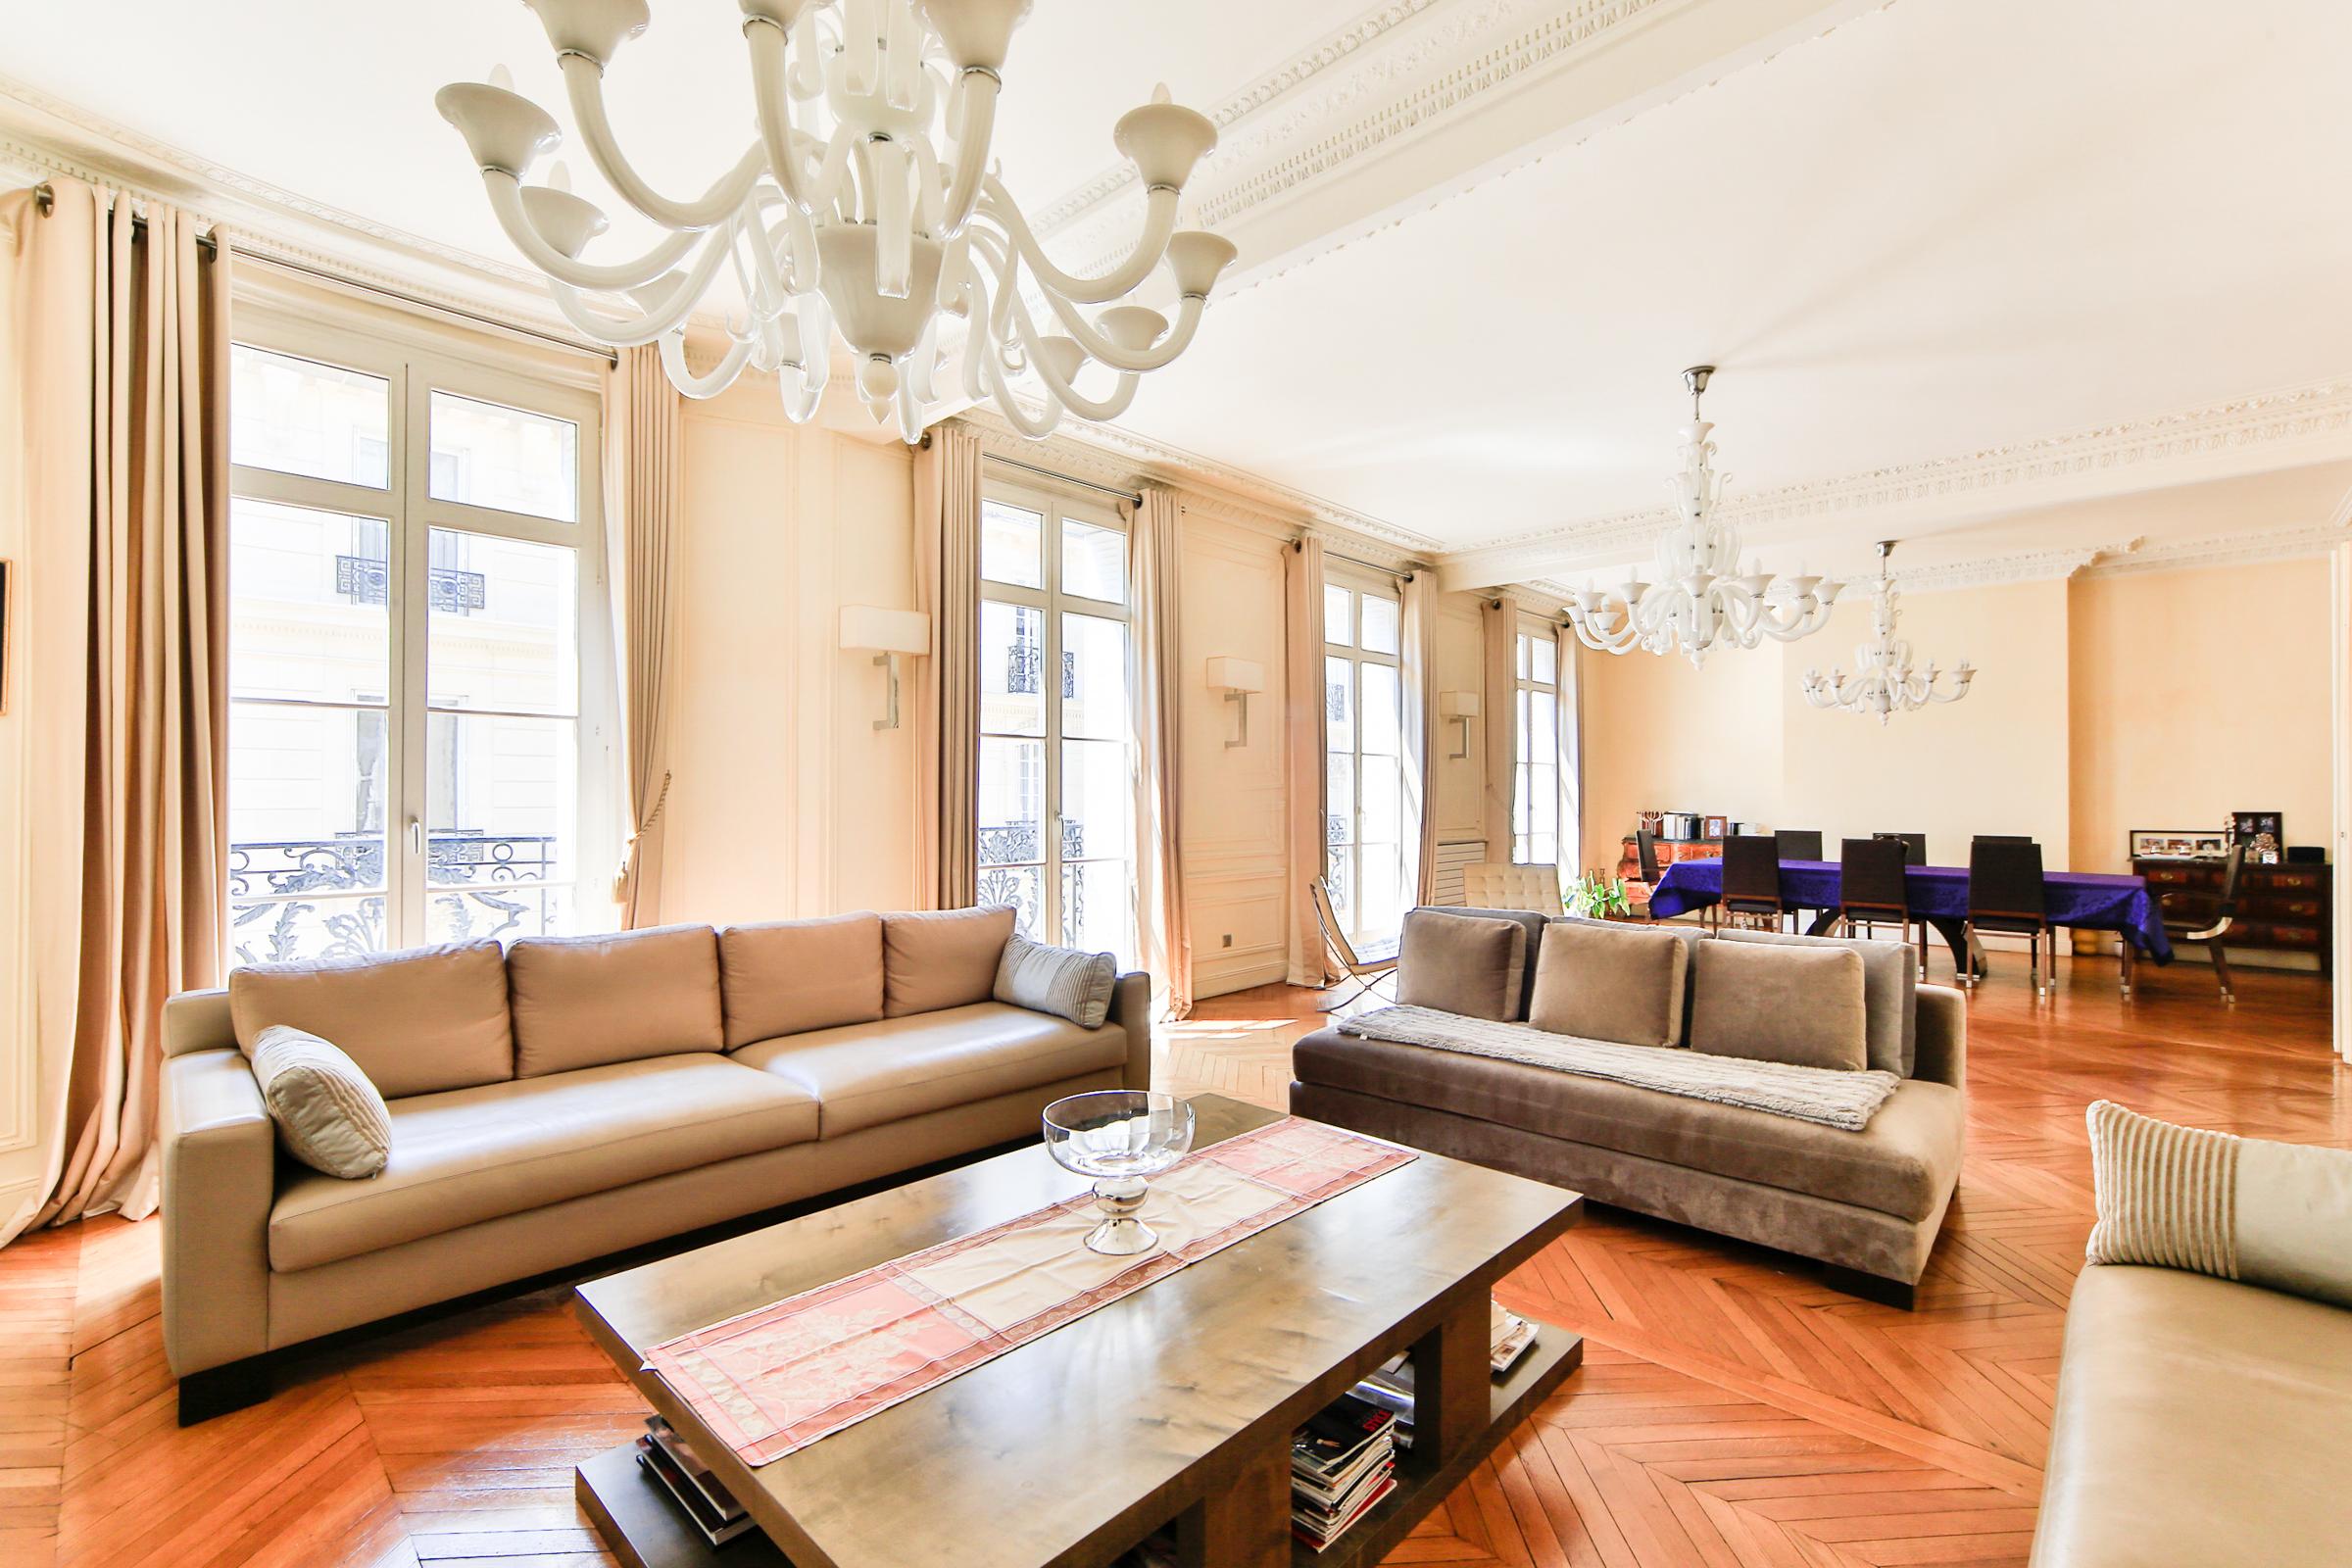 Appartamento per Vendita alle ore Apartment - OCDE Paris, Parigi 75016 Francia